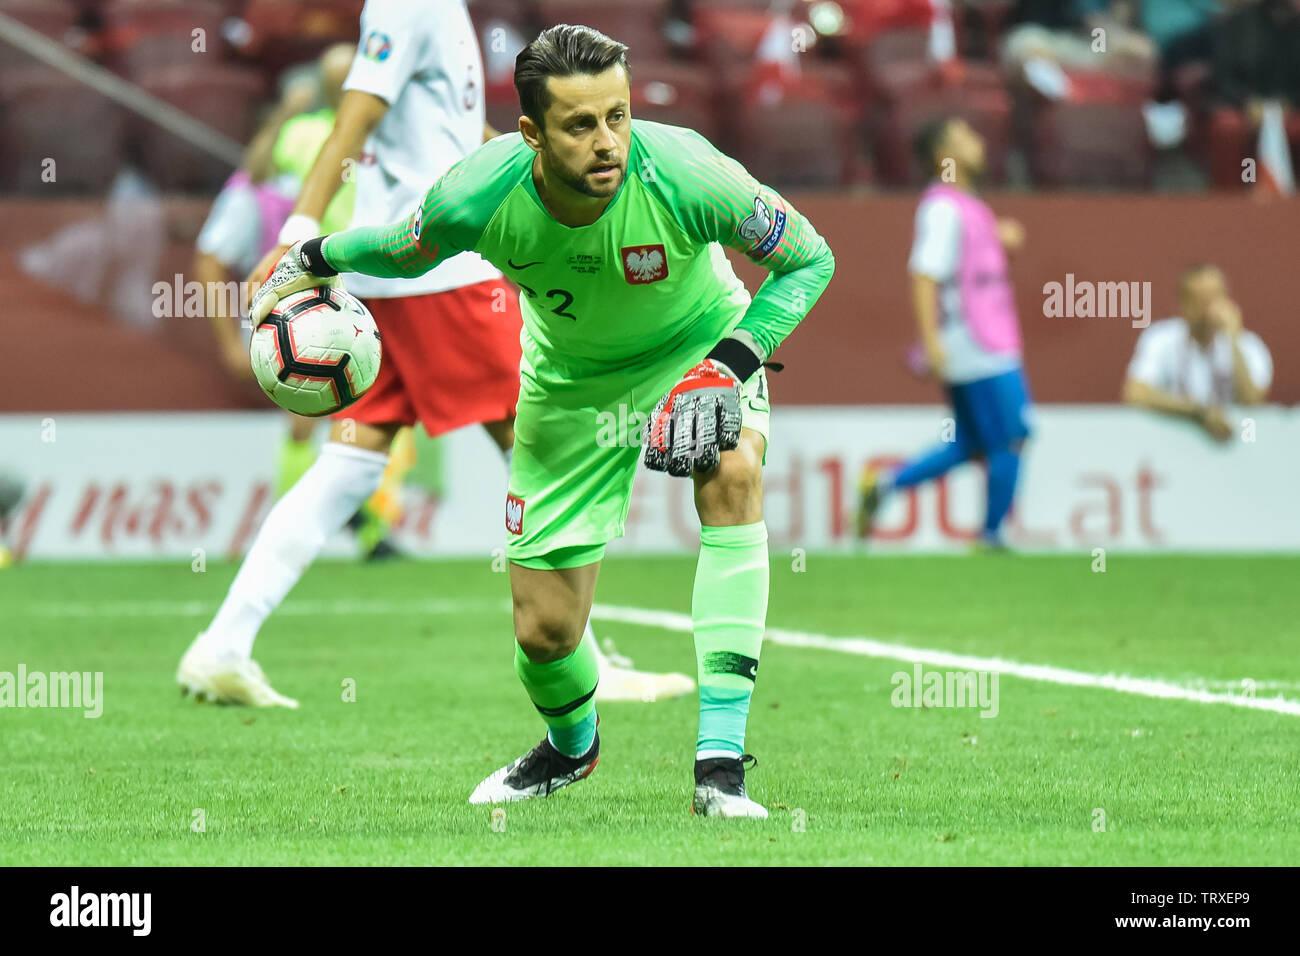 WARSAW, POLAND - JUNE 10, 2019: Qualifications Euro 2020  match Poland - Israel 4:0. In action goalkeeper Lukasz Fabianski. - Stock Image